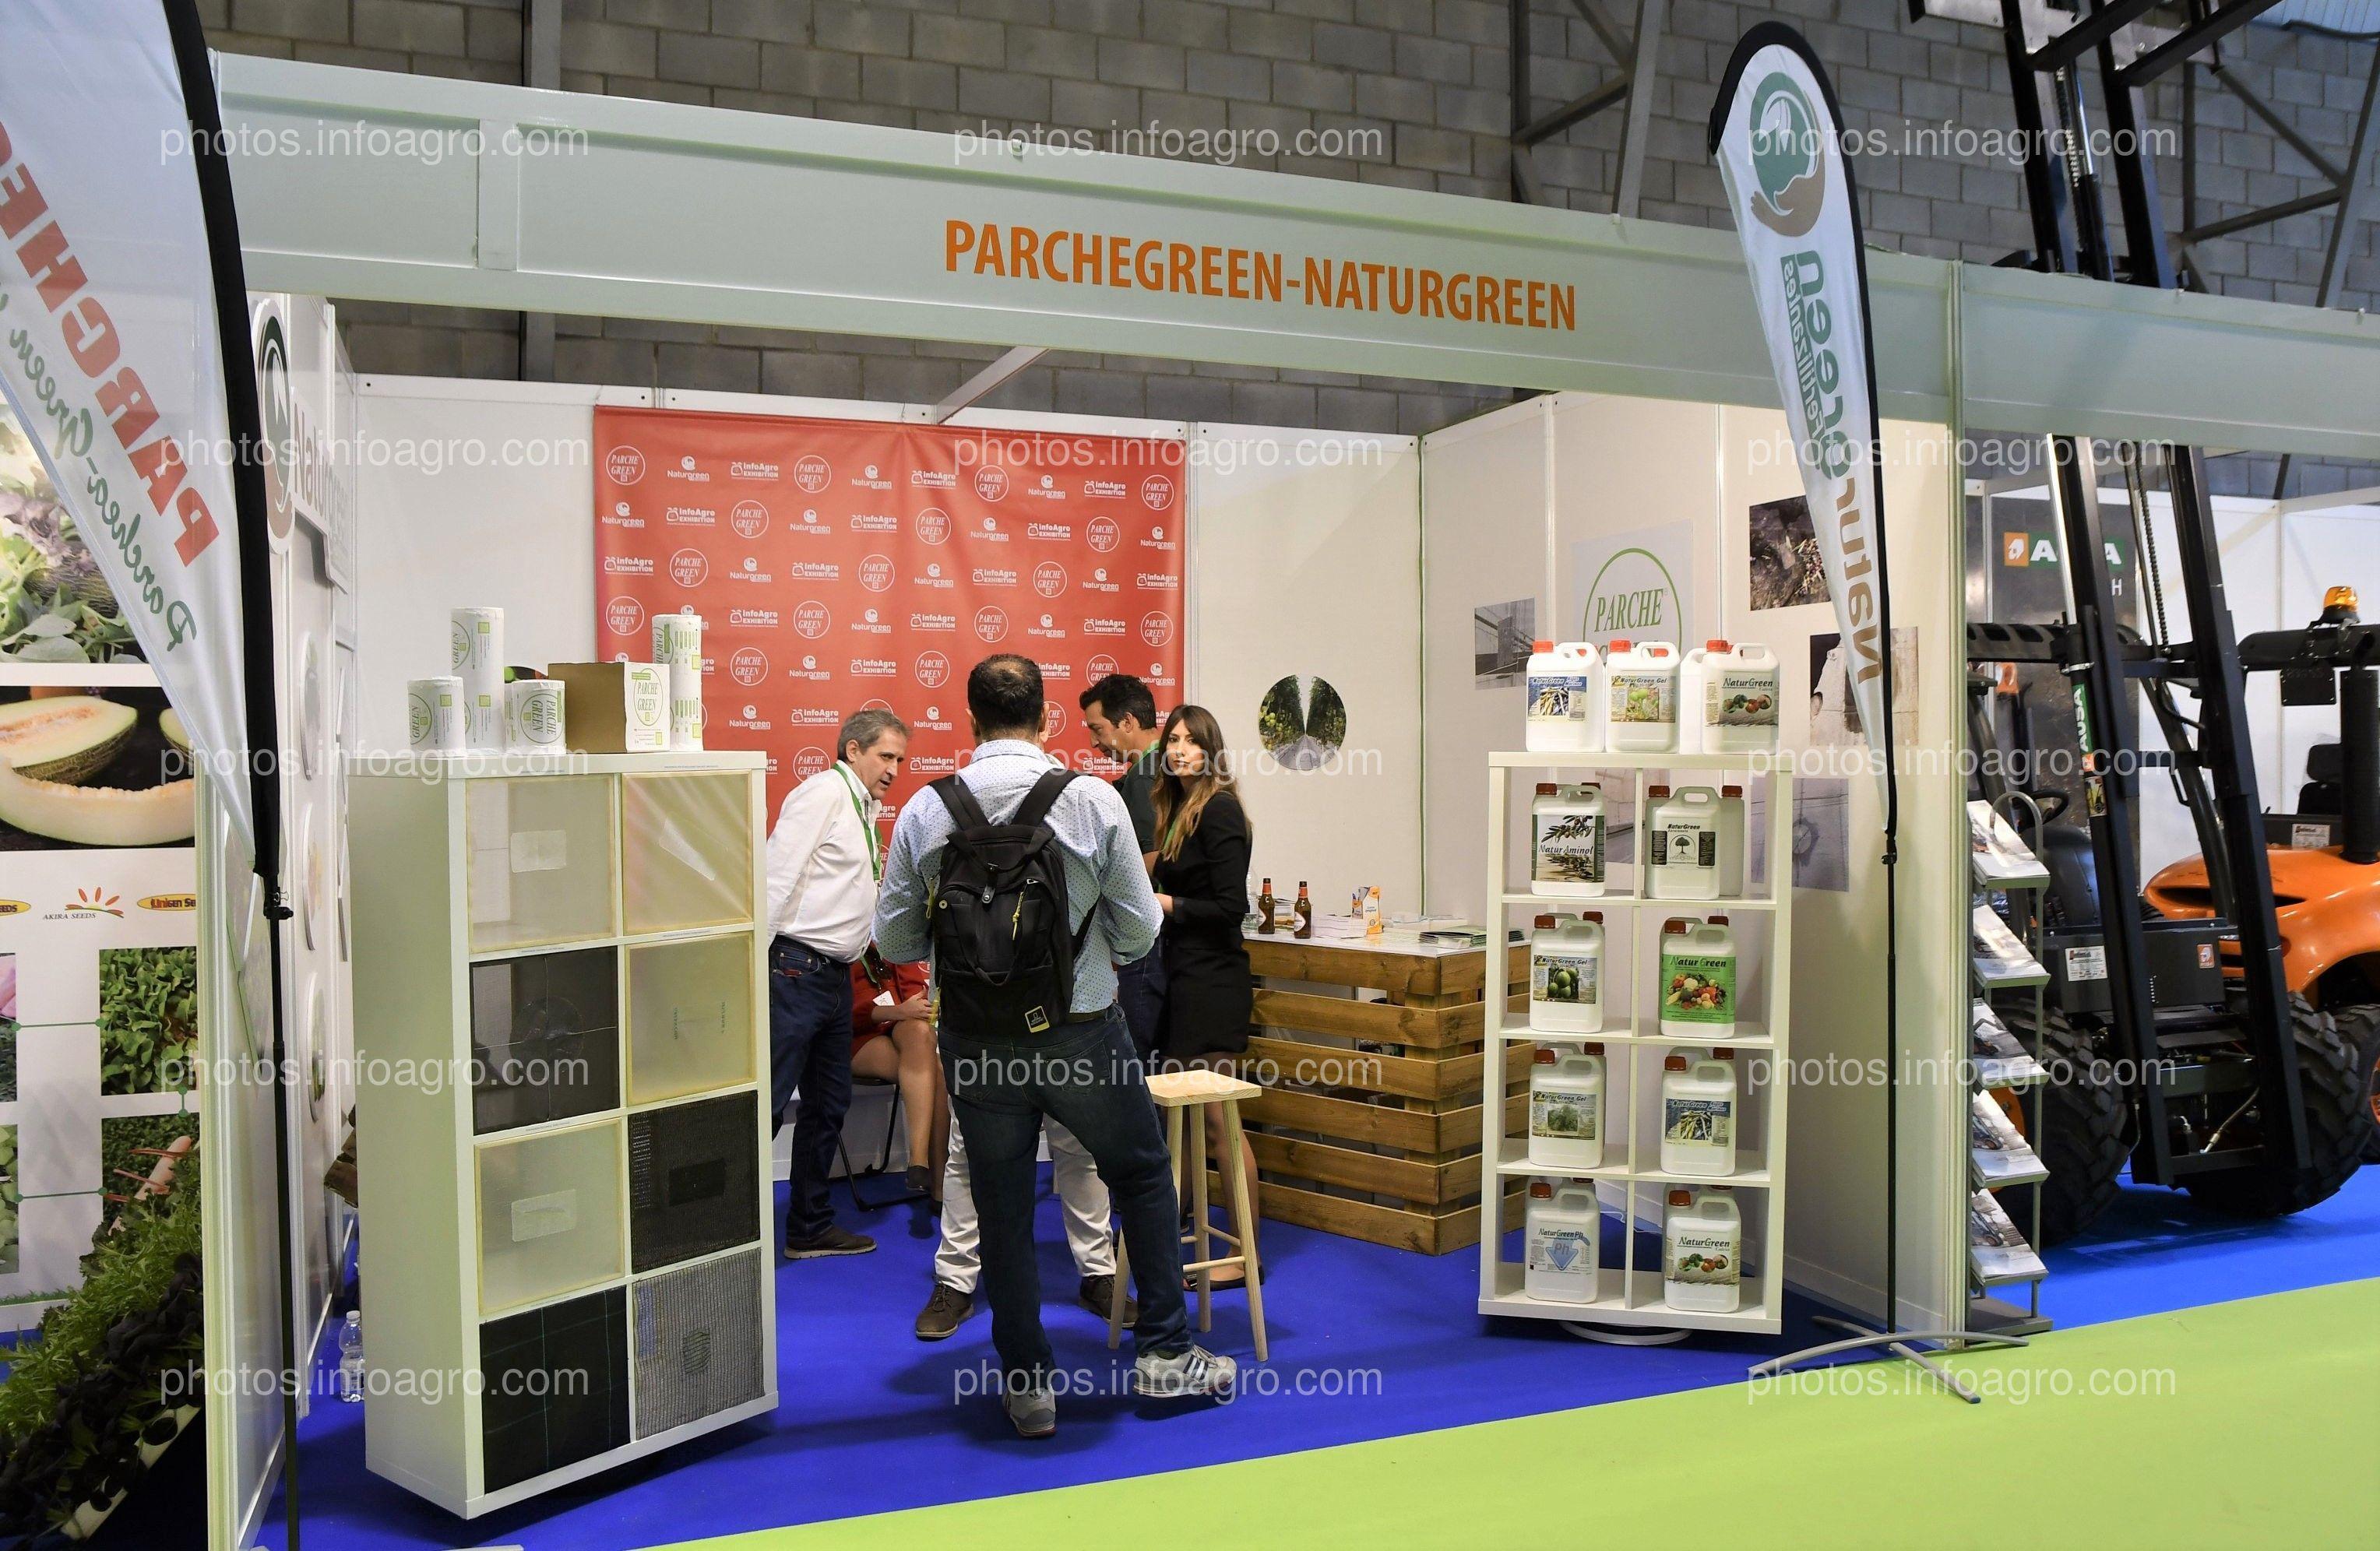 Parchegreen y Naturgreen - Stand Infoagro Exhibition